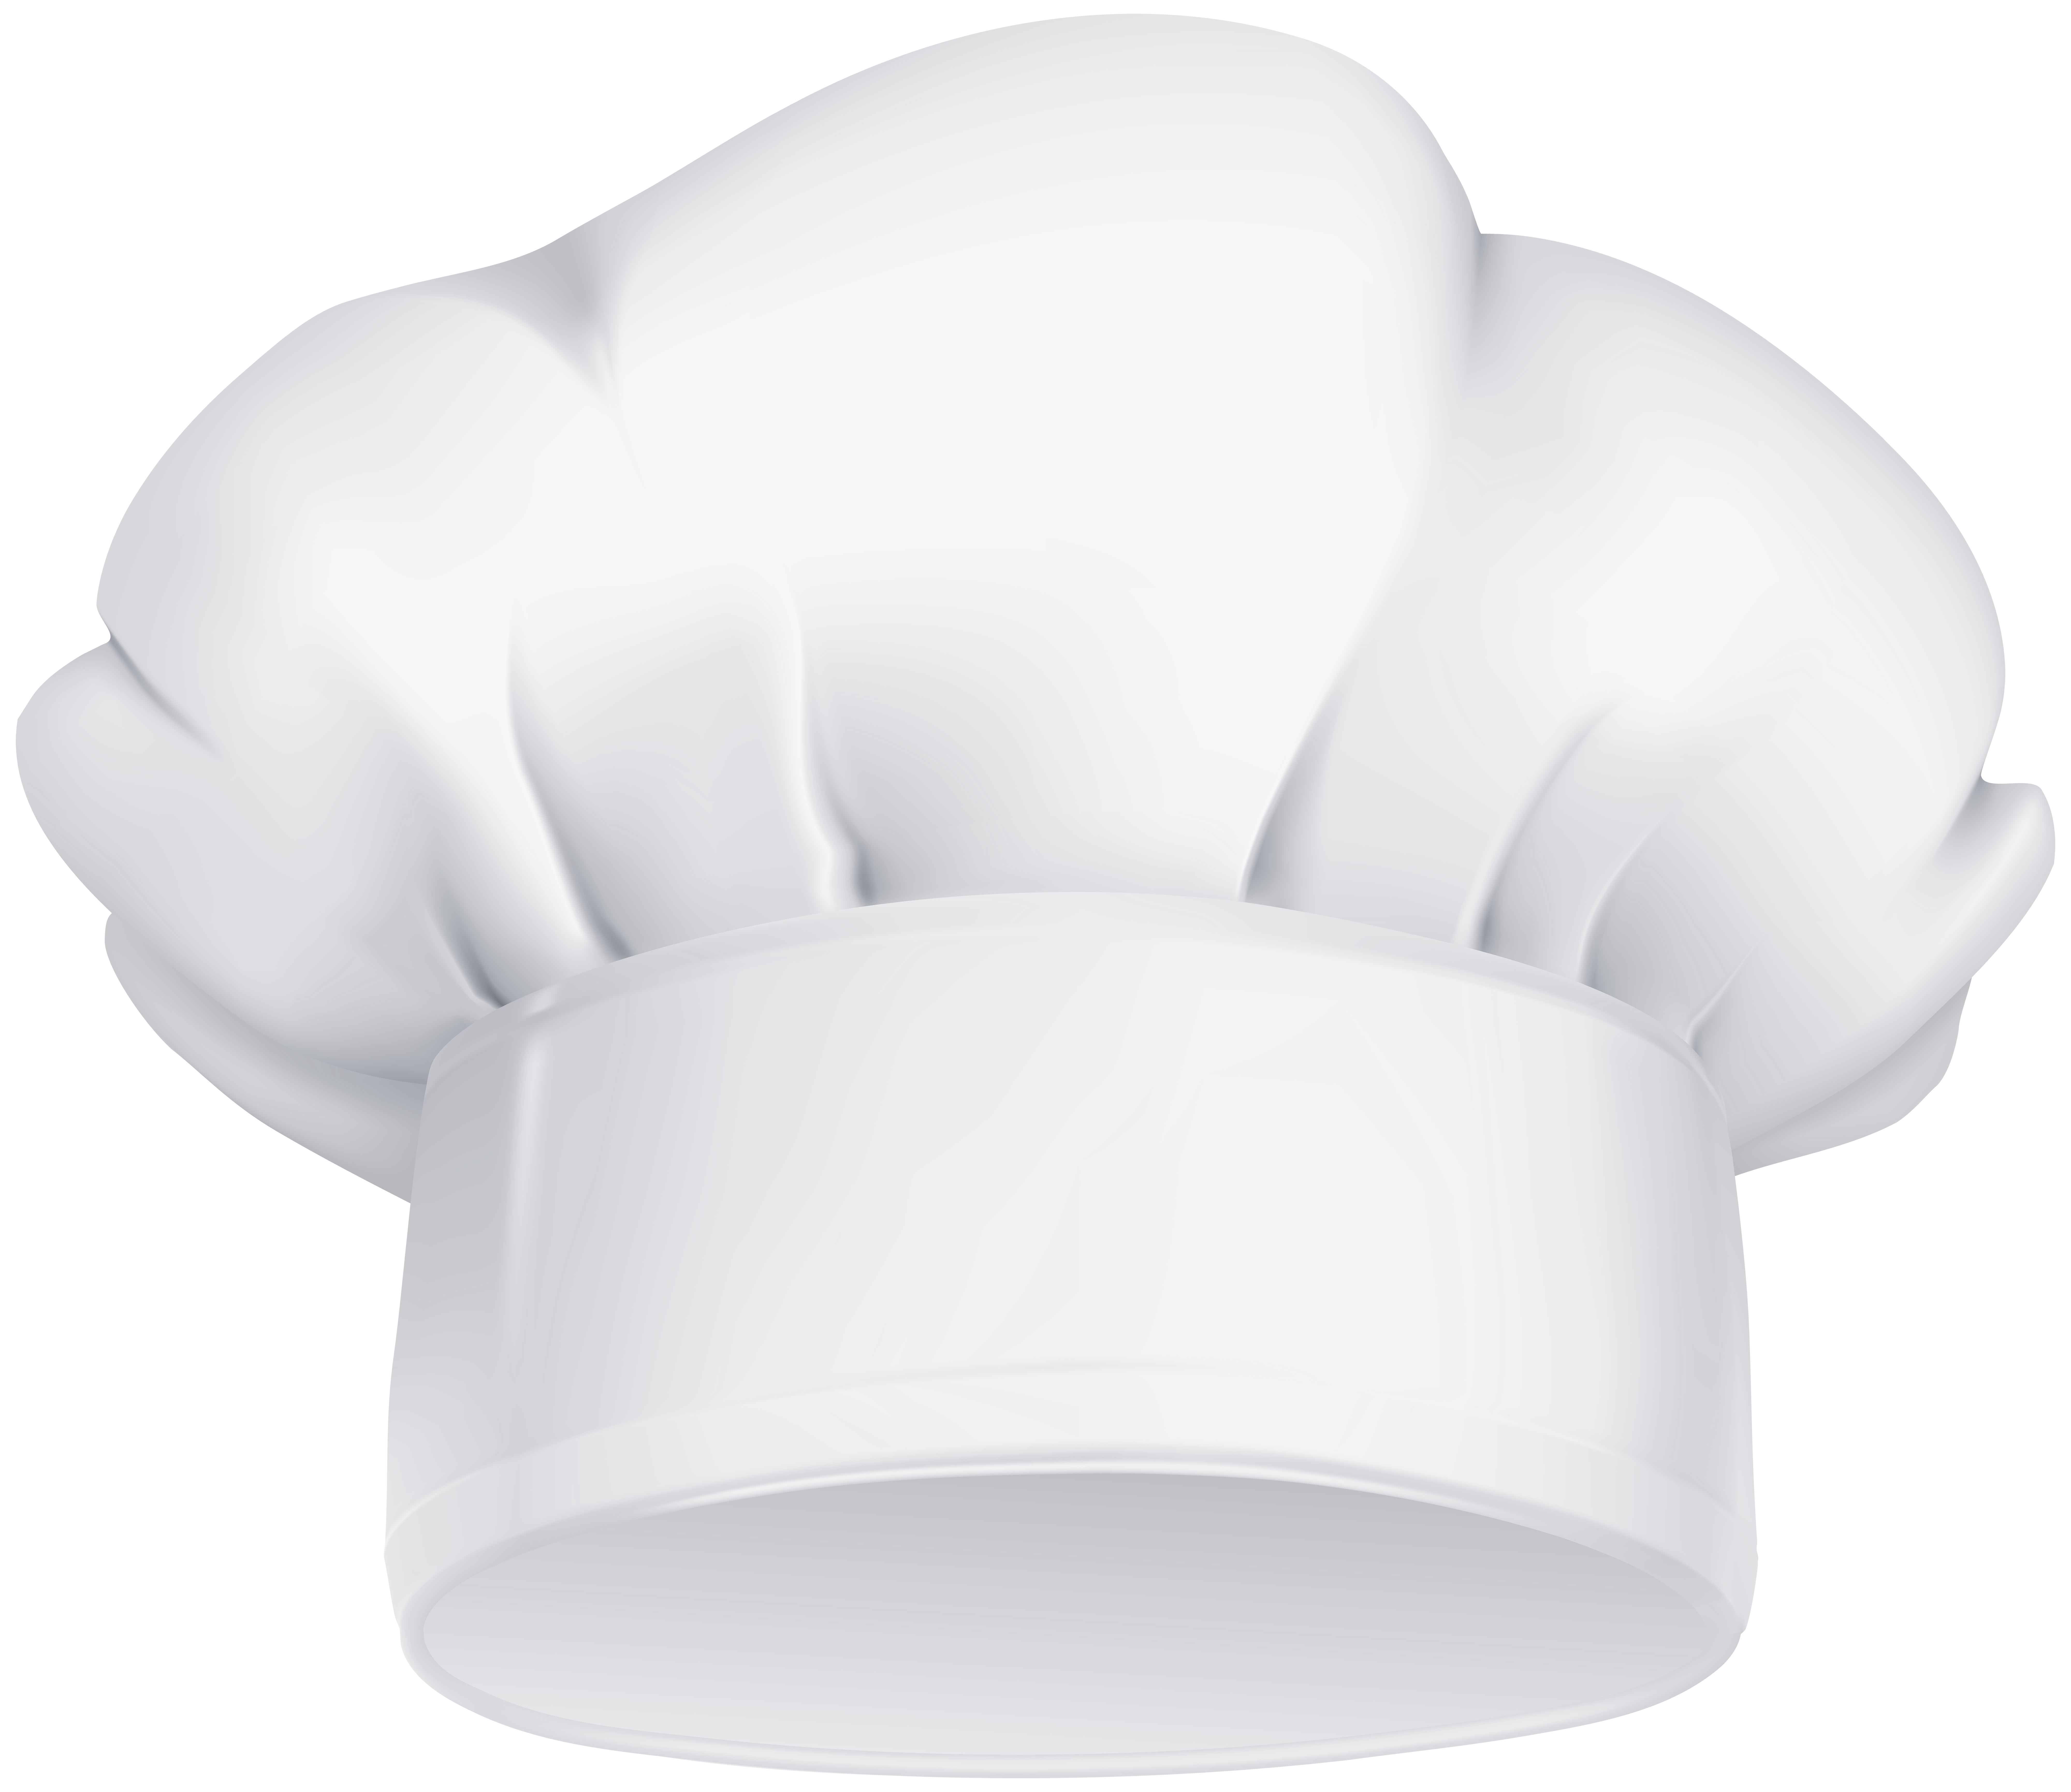 Chef Cap Chefs Hat Clip Art Free Clip Art